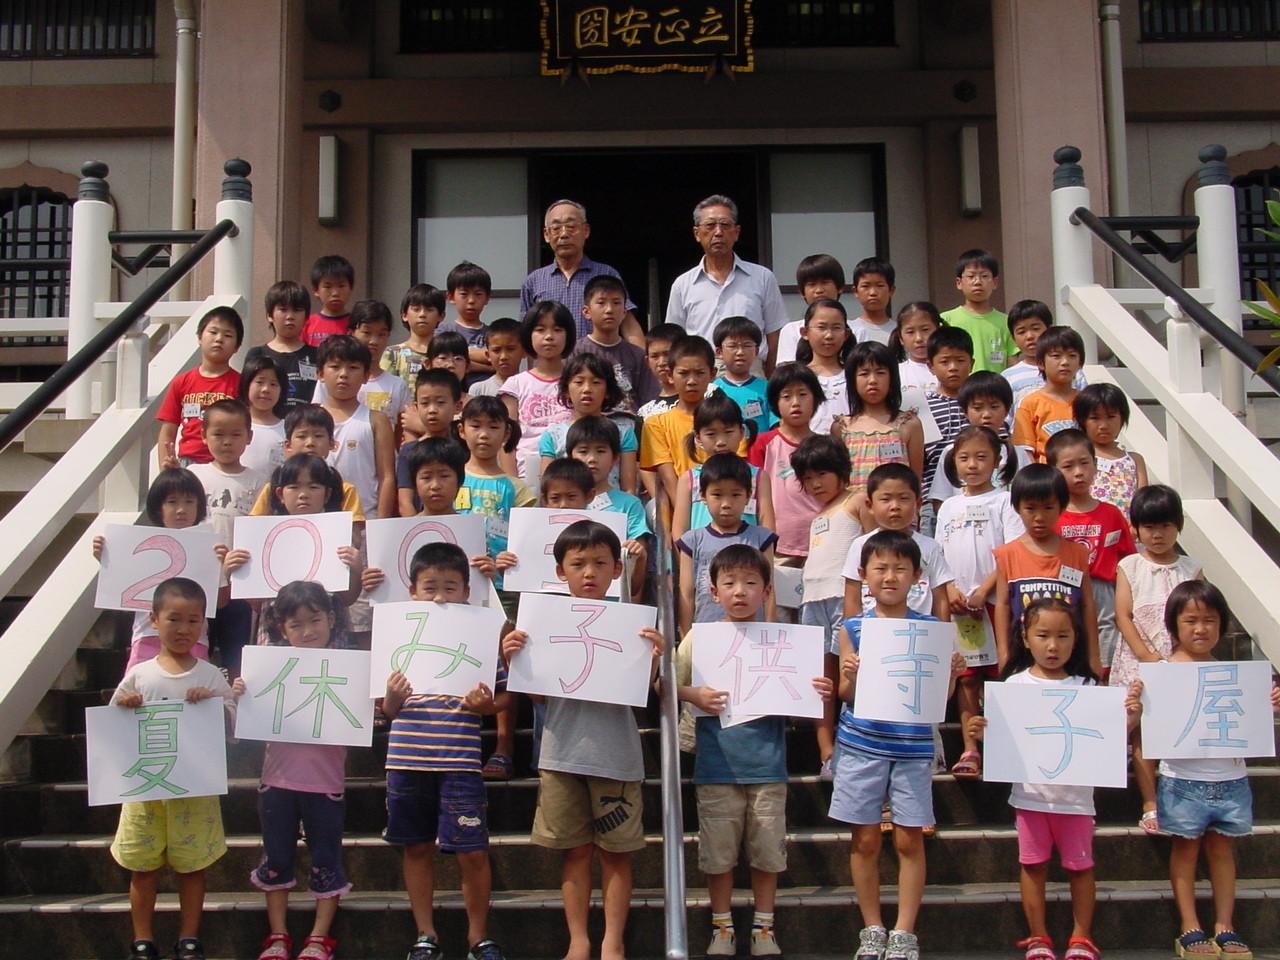 第1回 夏休み寺子屋2003